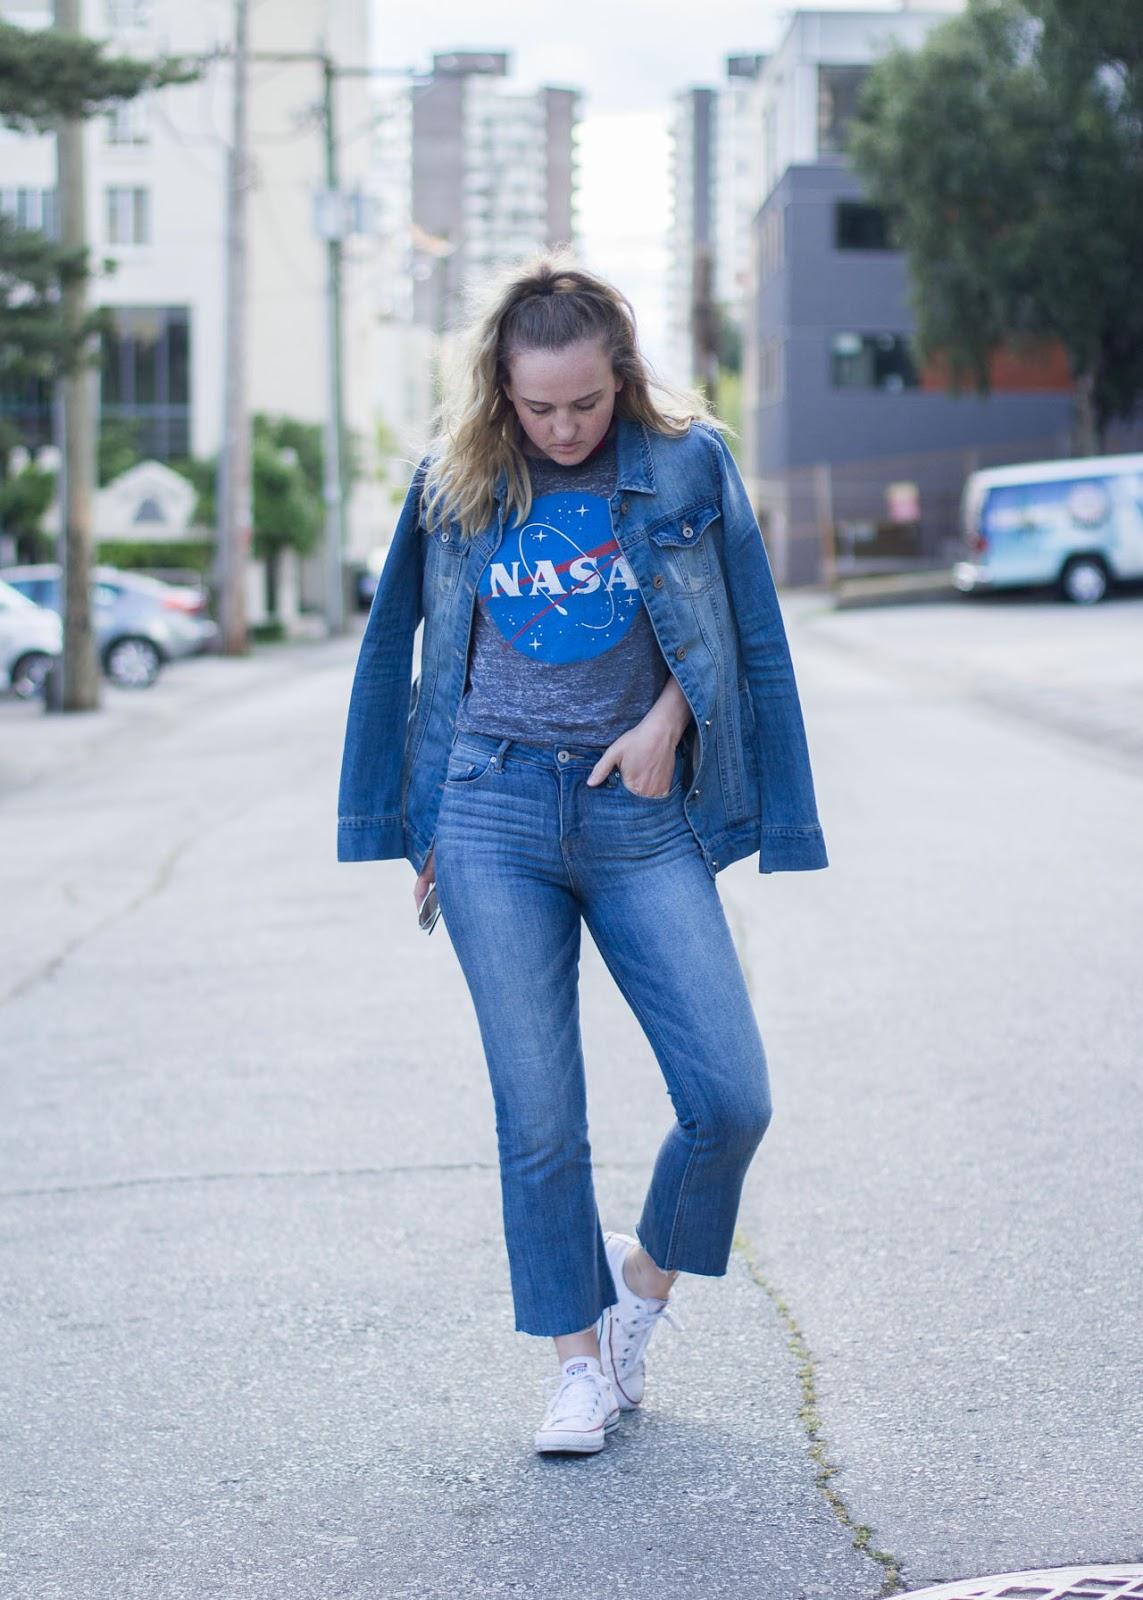 Canada Fashion Magazine: Vancouver Fashion And Personal Style Blog: NASA